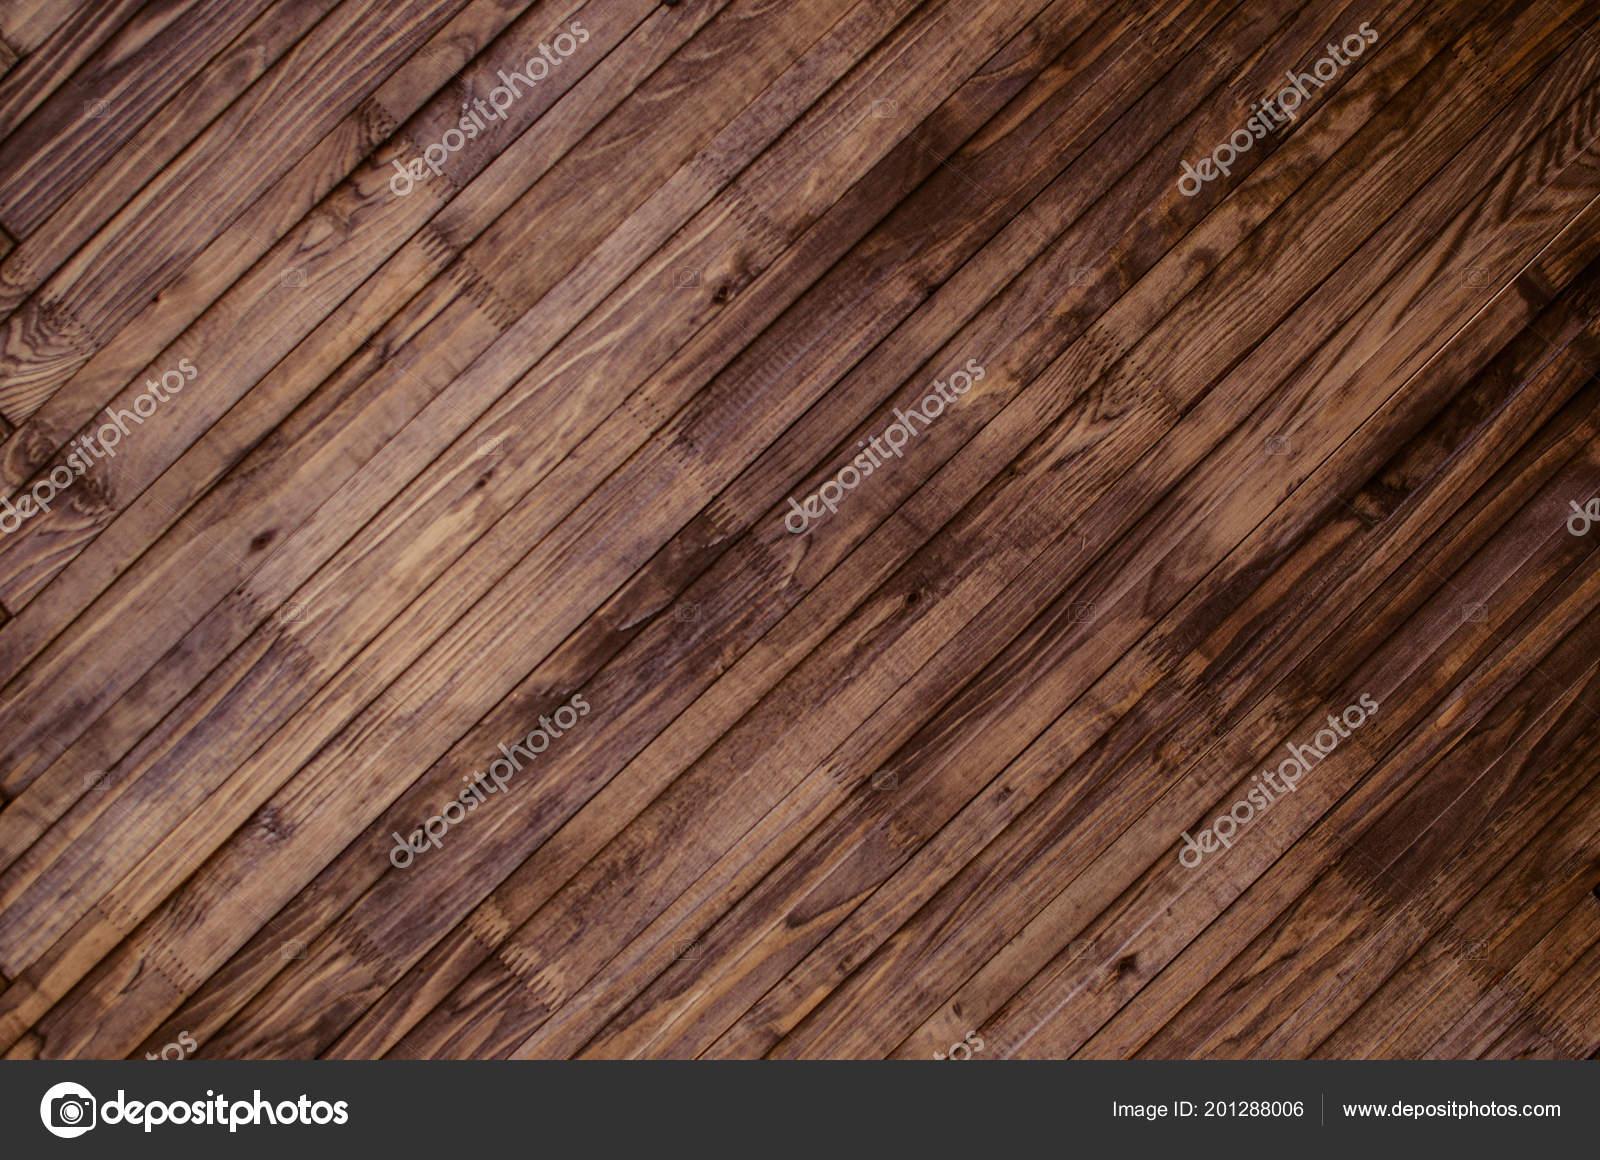 Wooden Texture Wood Background Dark Wood Stock Photo Usia90bk